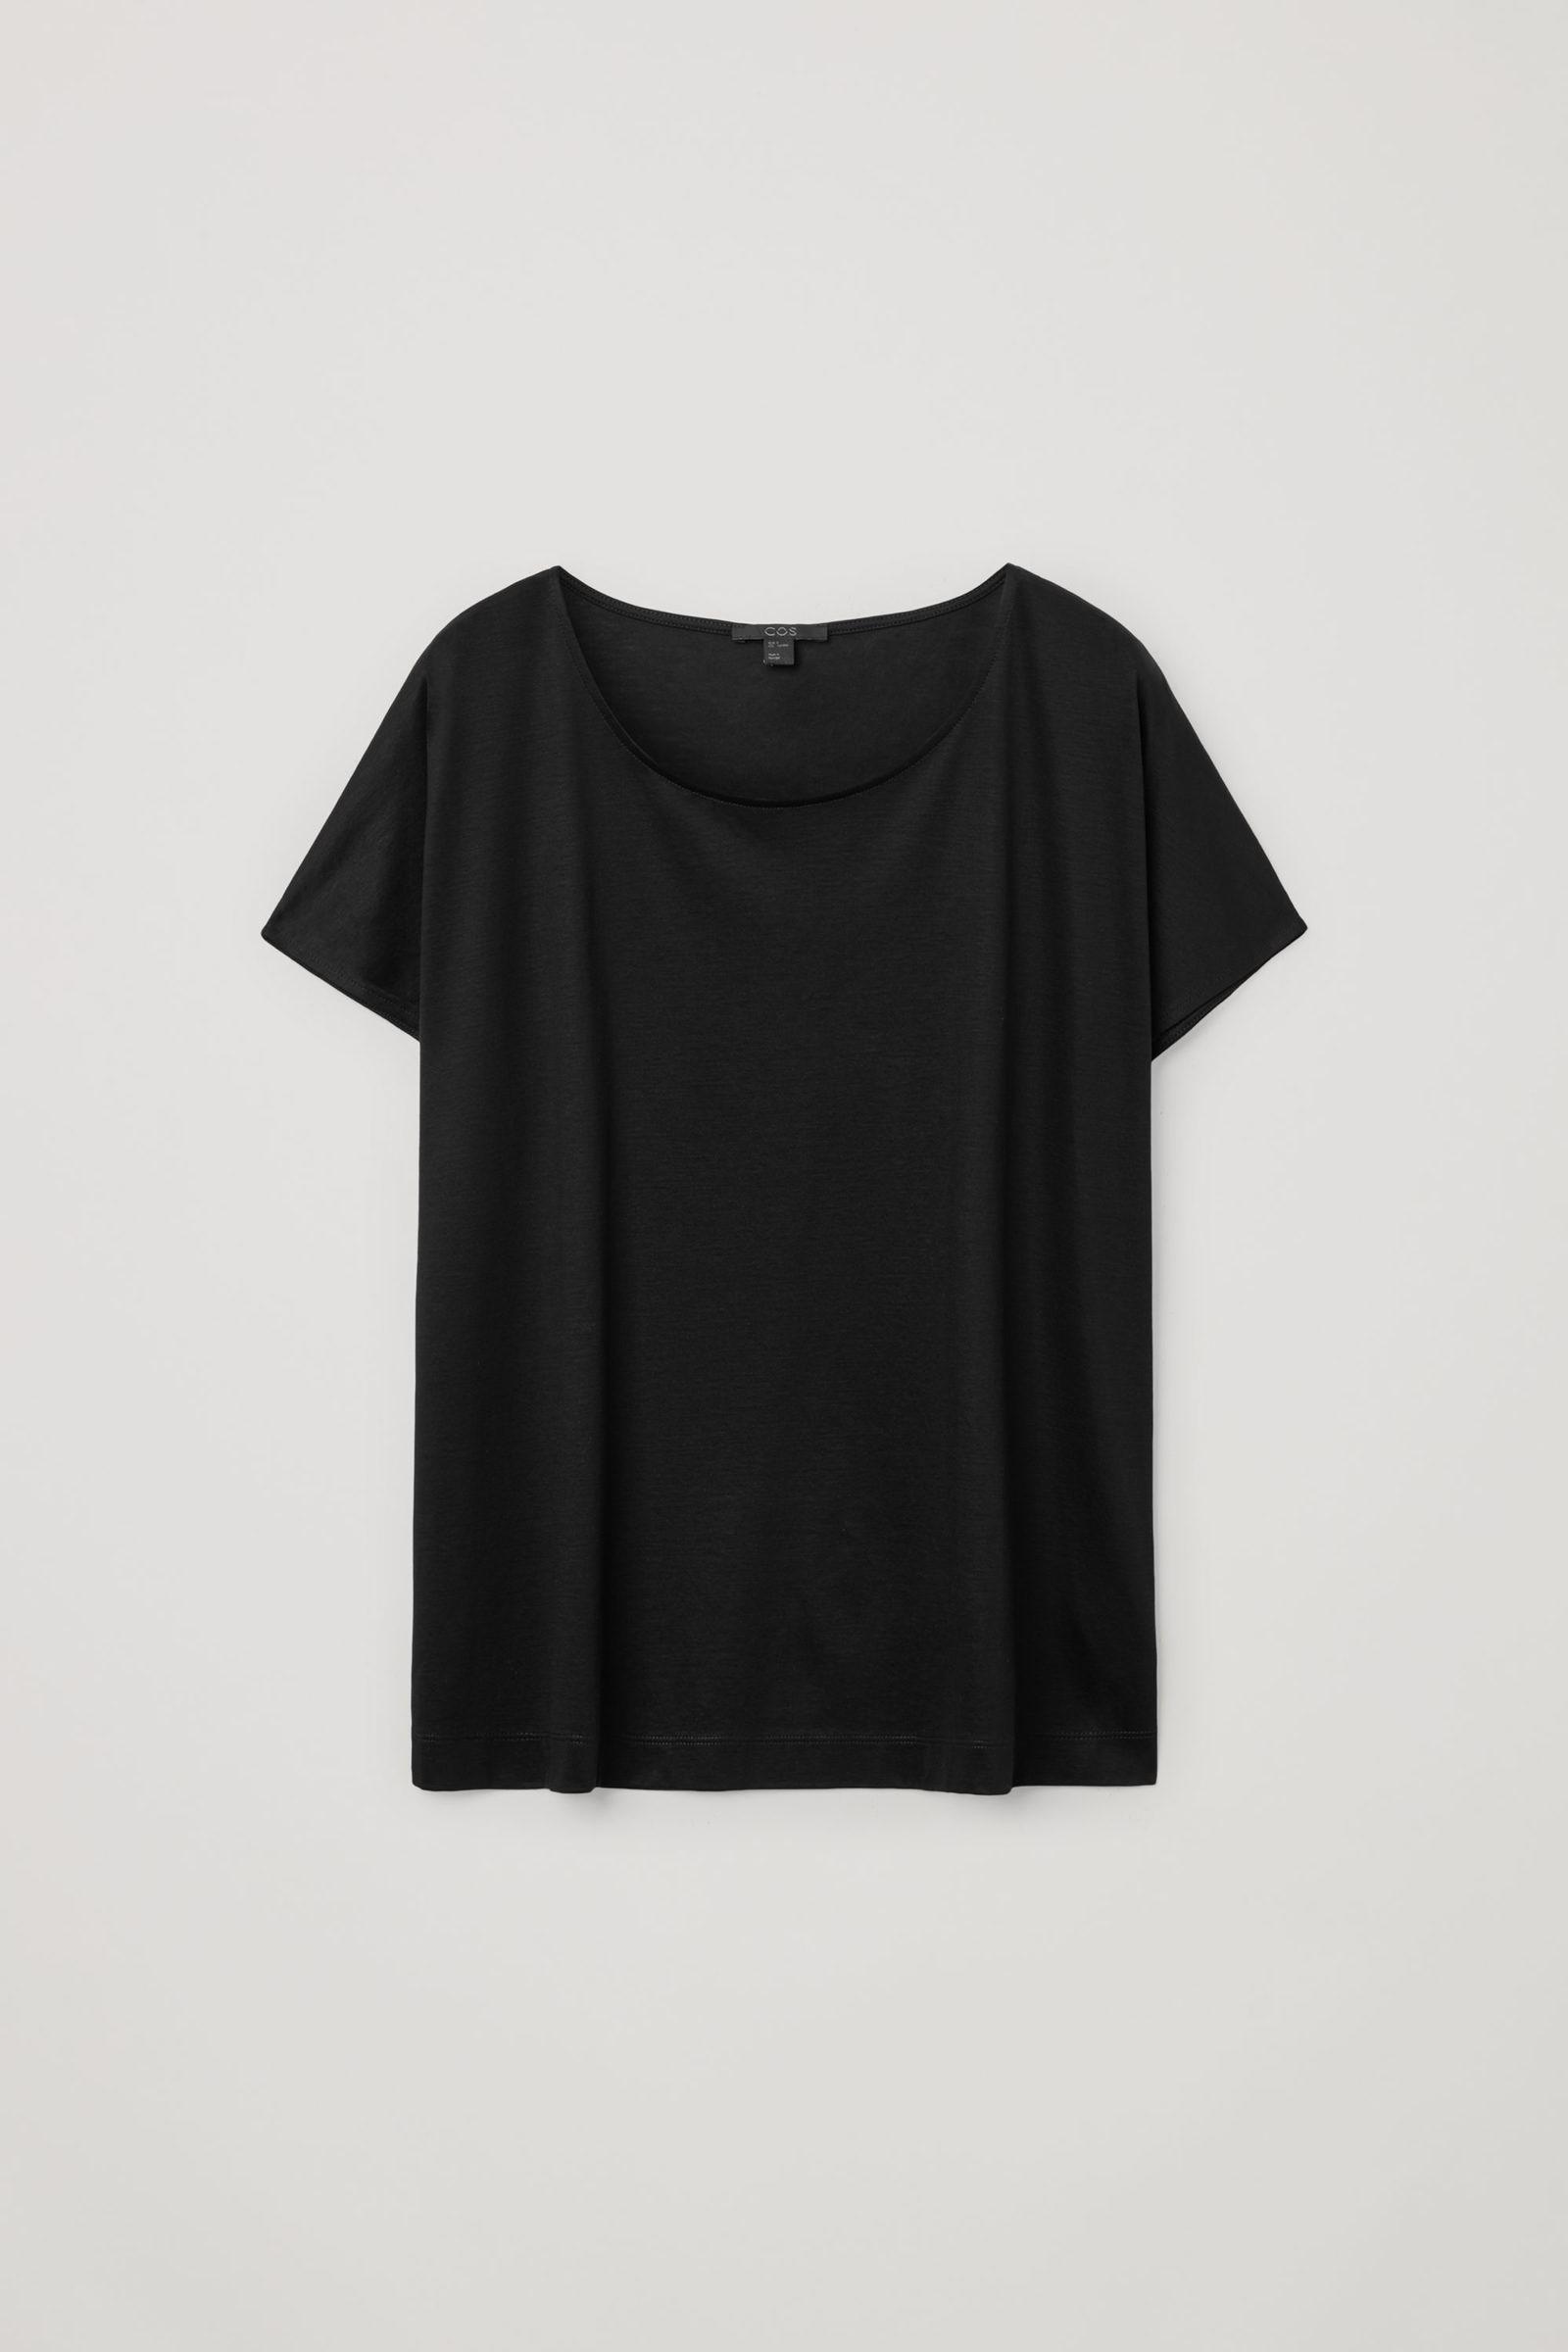 COS 라이오셀 오가닉 코튼 믹스 스퀘어 컷 티셔츠의 블랙컬러 Product입니다.